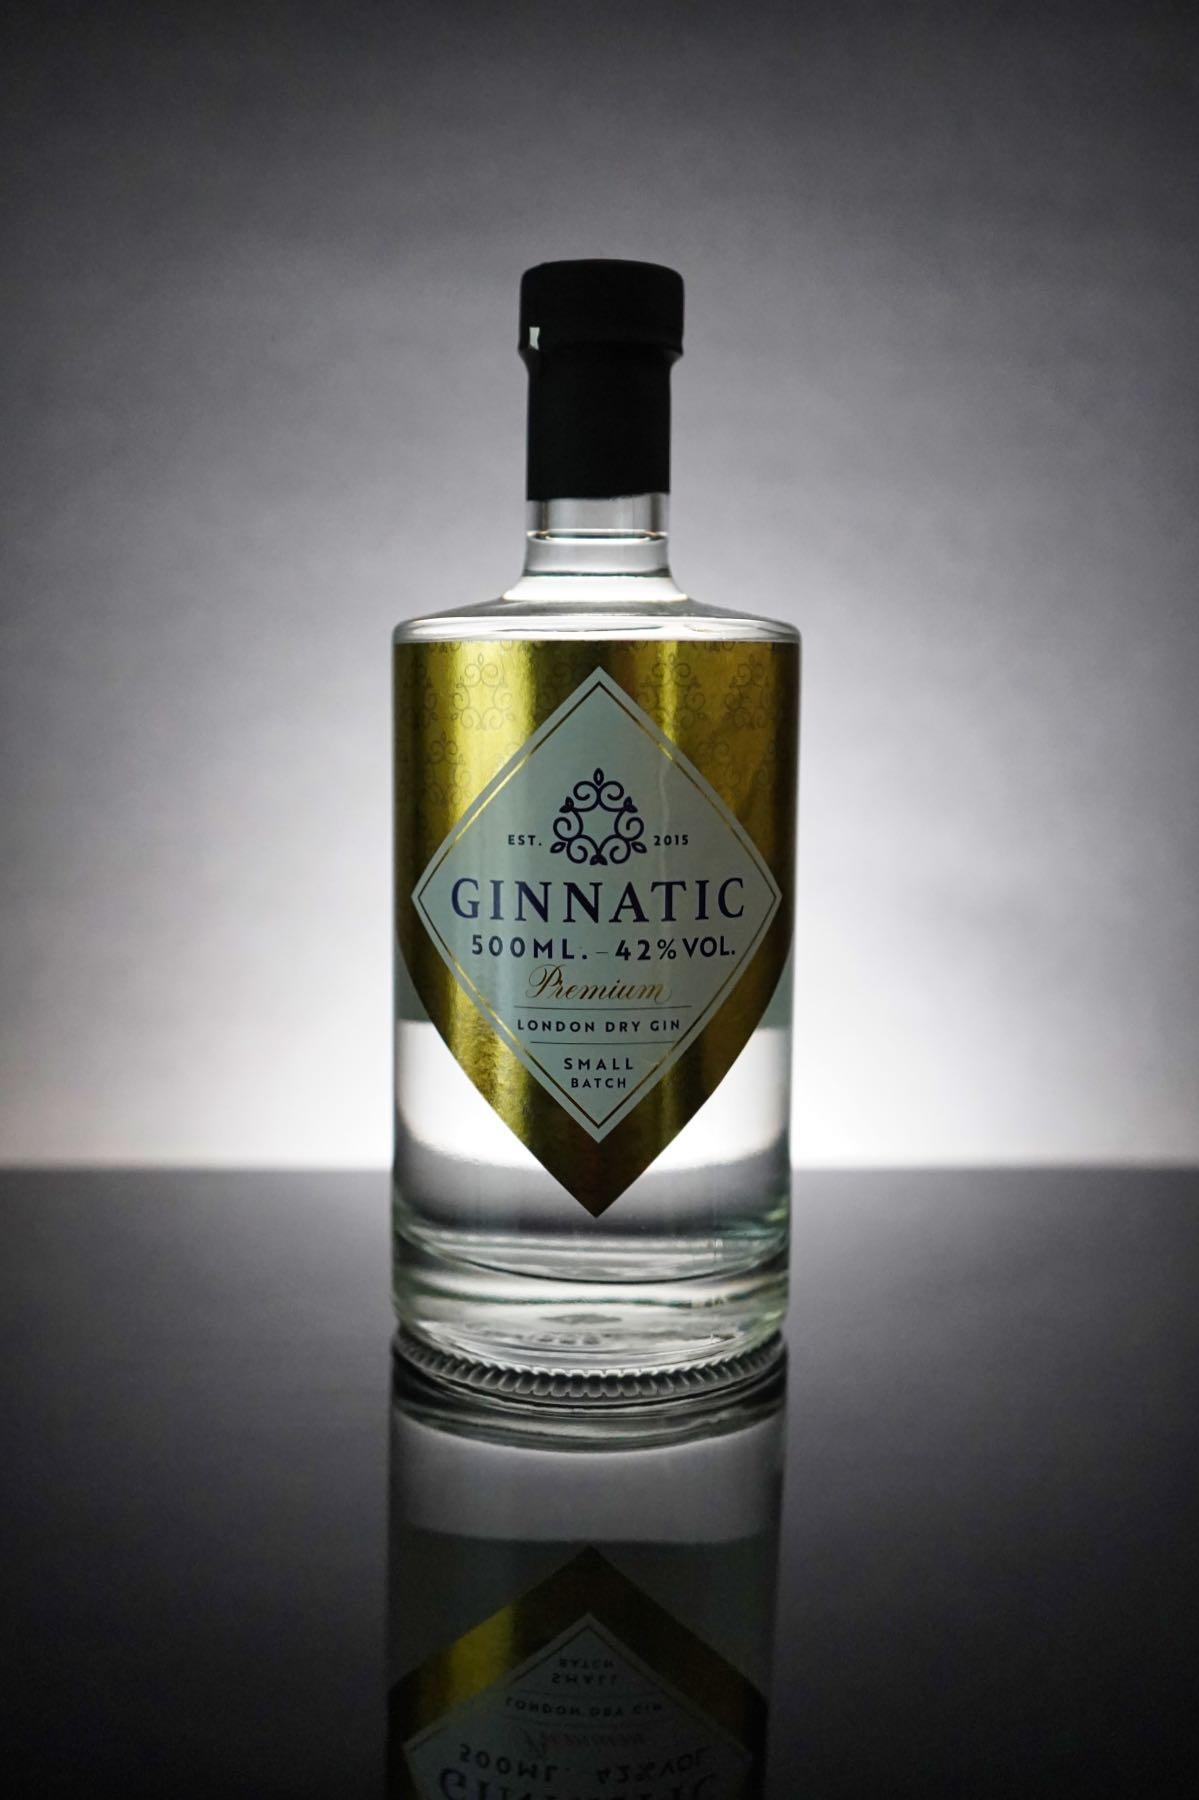 Ginnatic London Dry Gin